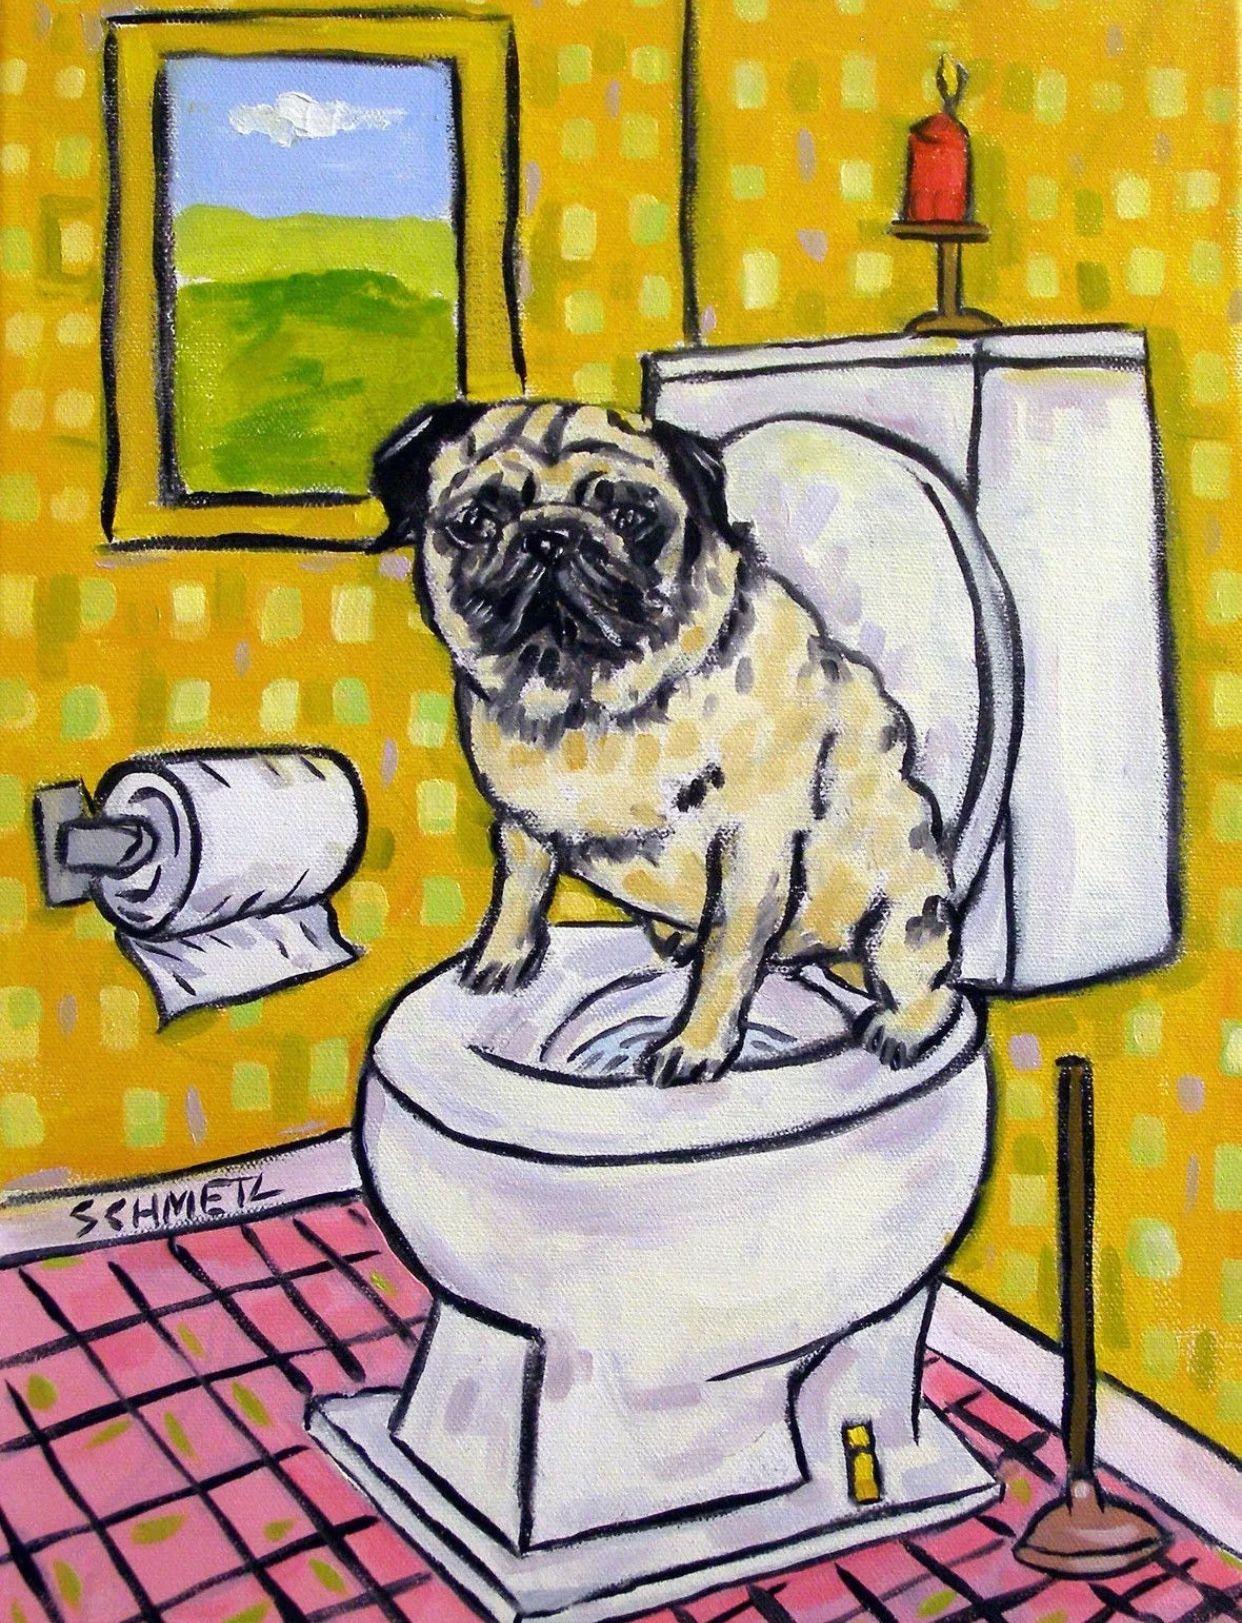 PUG ART PRINT bathrooml 4x6 Dog Poster Pop Art Modern Abstract Folk Art glossy